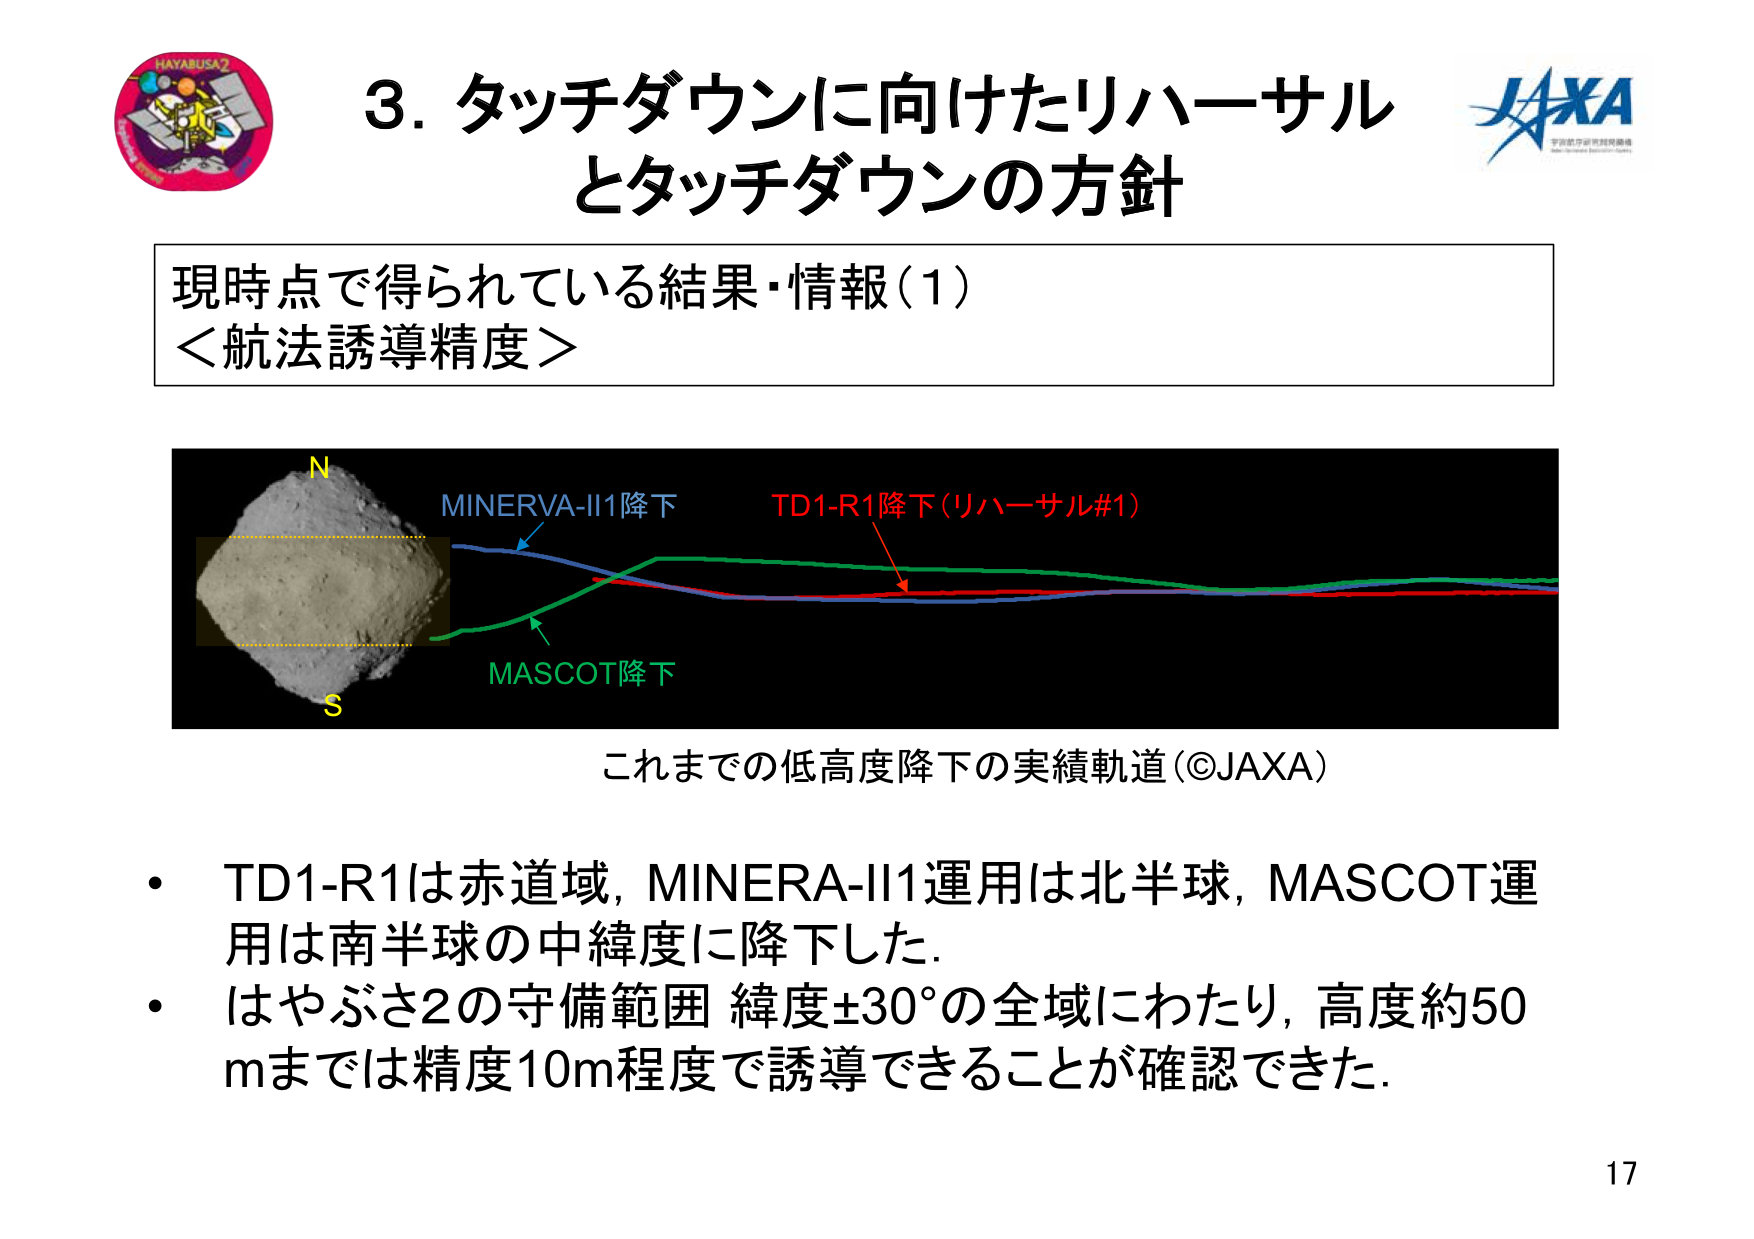 f:id:Imamura:20181011153956p:plain